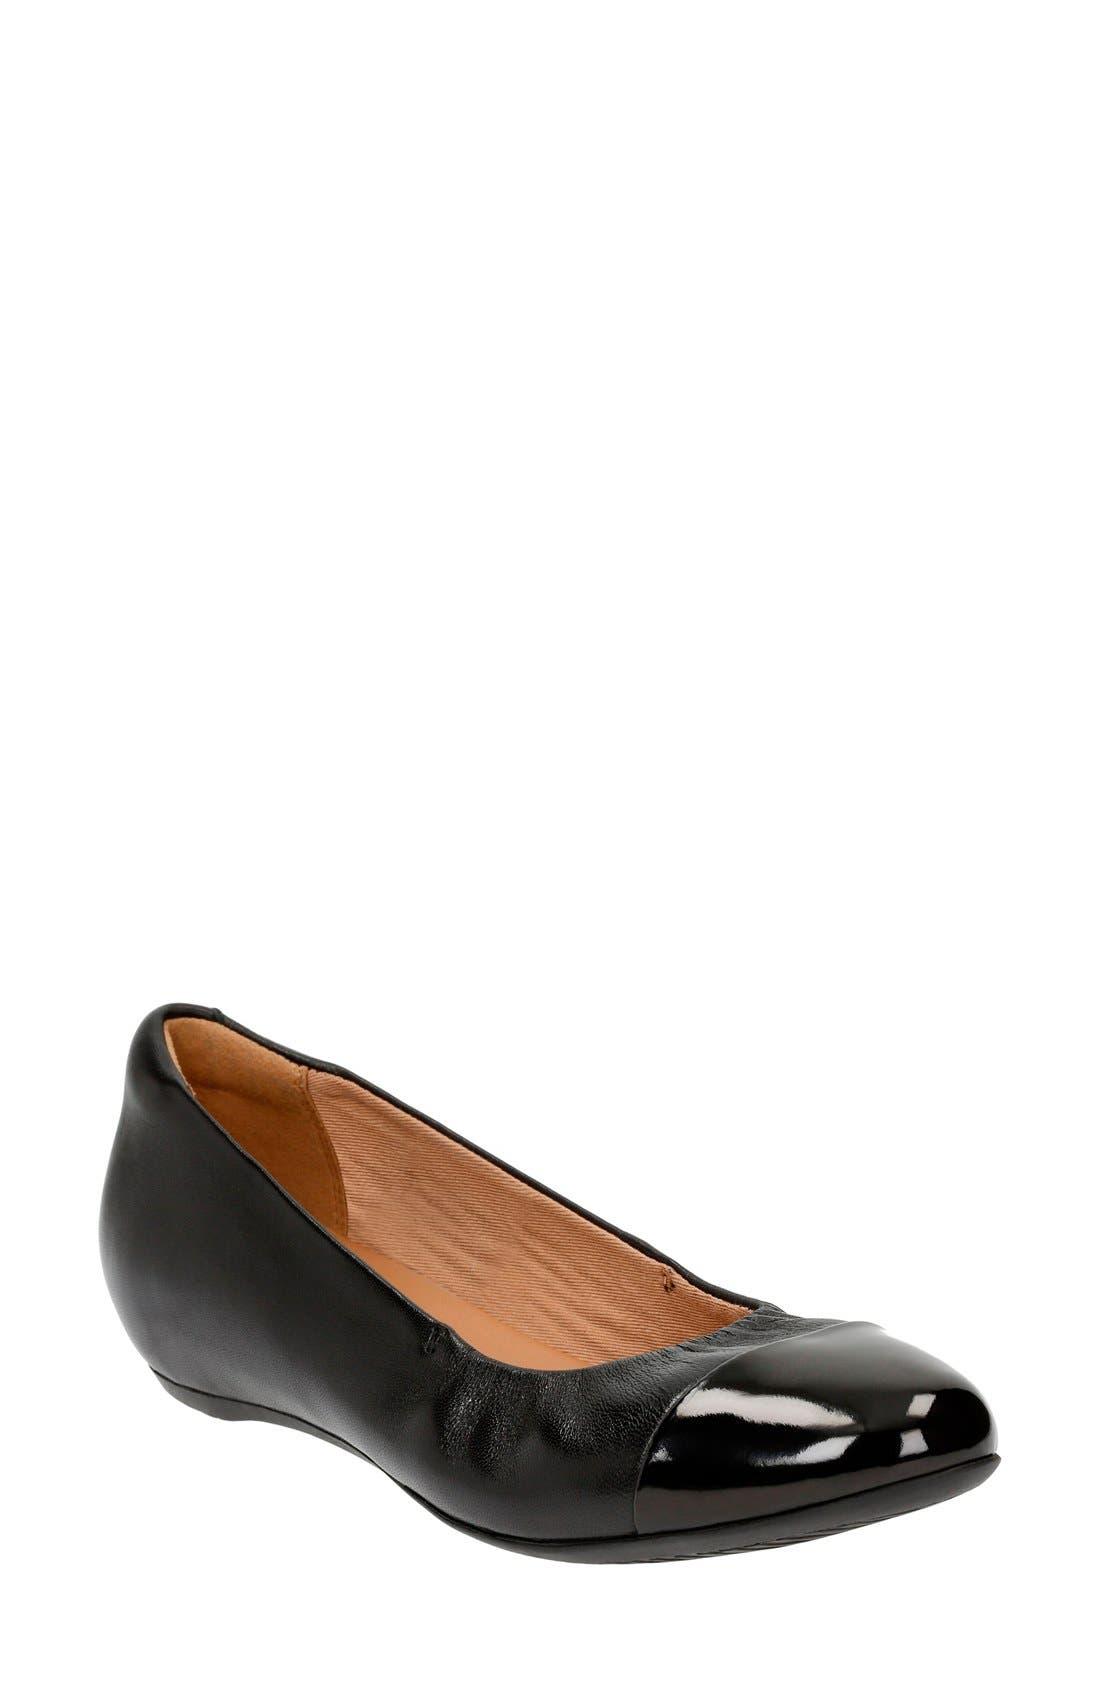 Alternate Image 1 Selected - Clarks® 'Alitay Susan' Cap Toe Flat (Women)